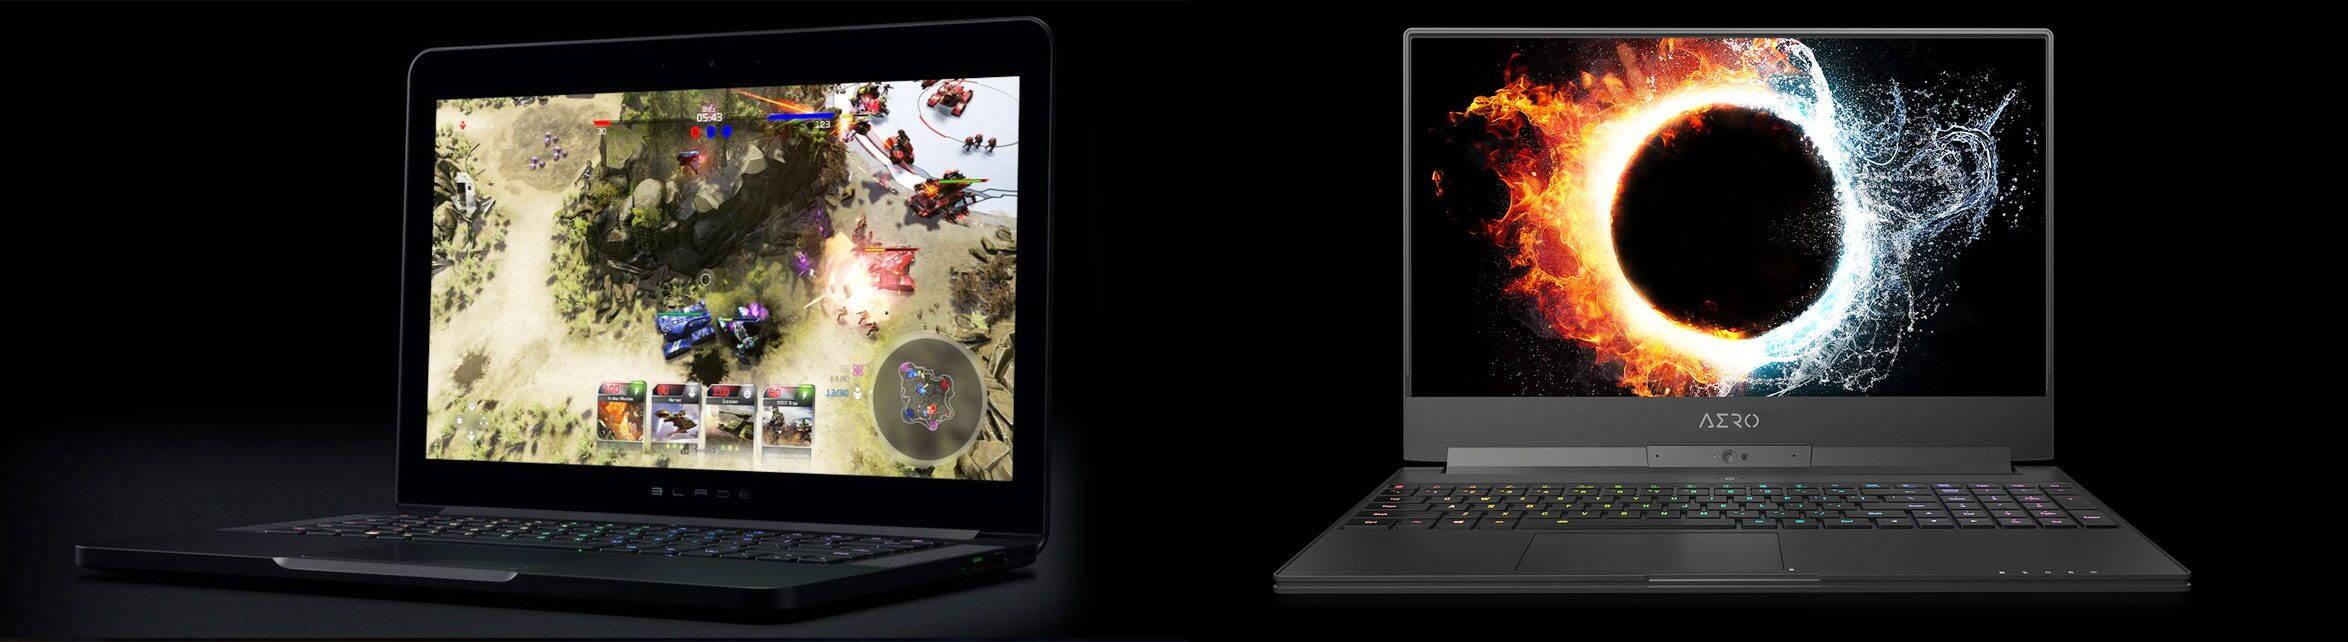 Laptopuri de gaming ultraportabile: Acer Triton și Asus Zephyrus